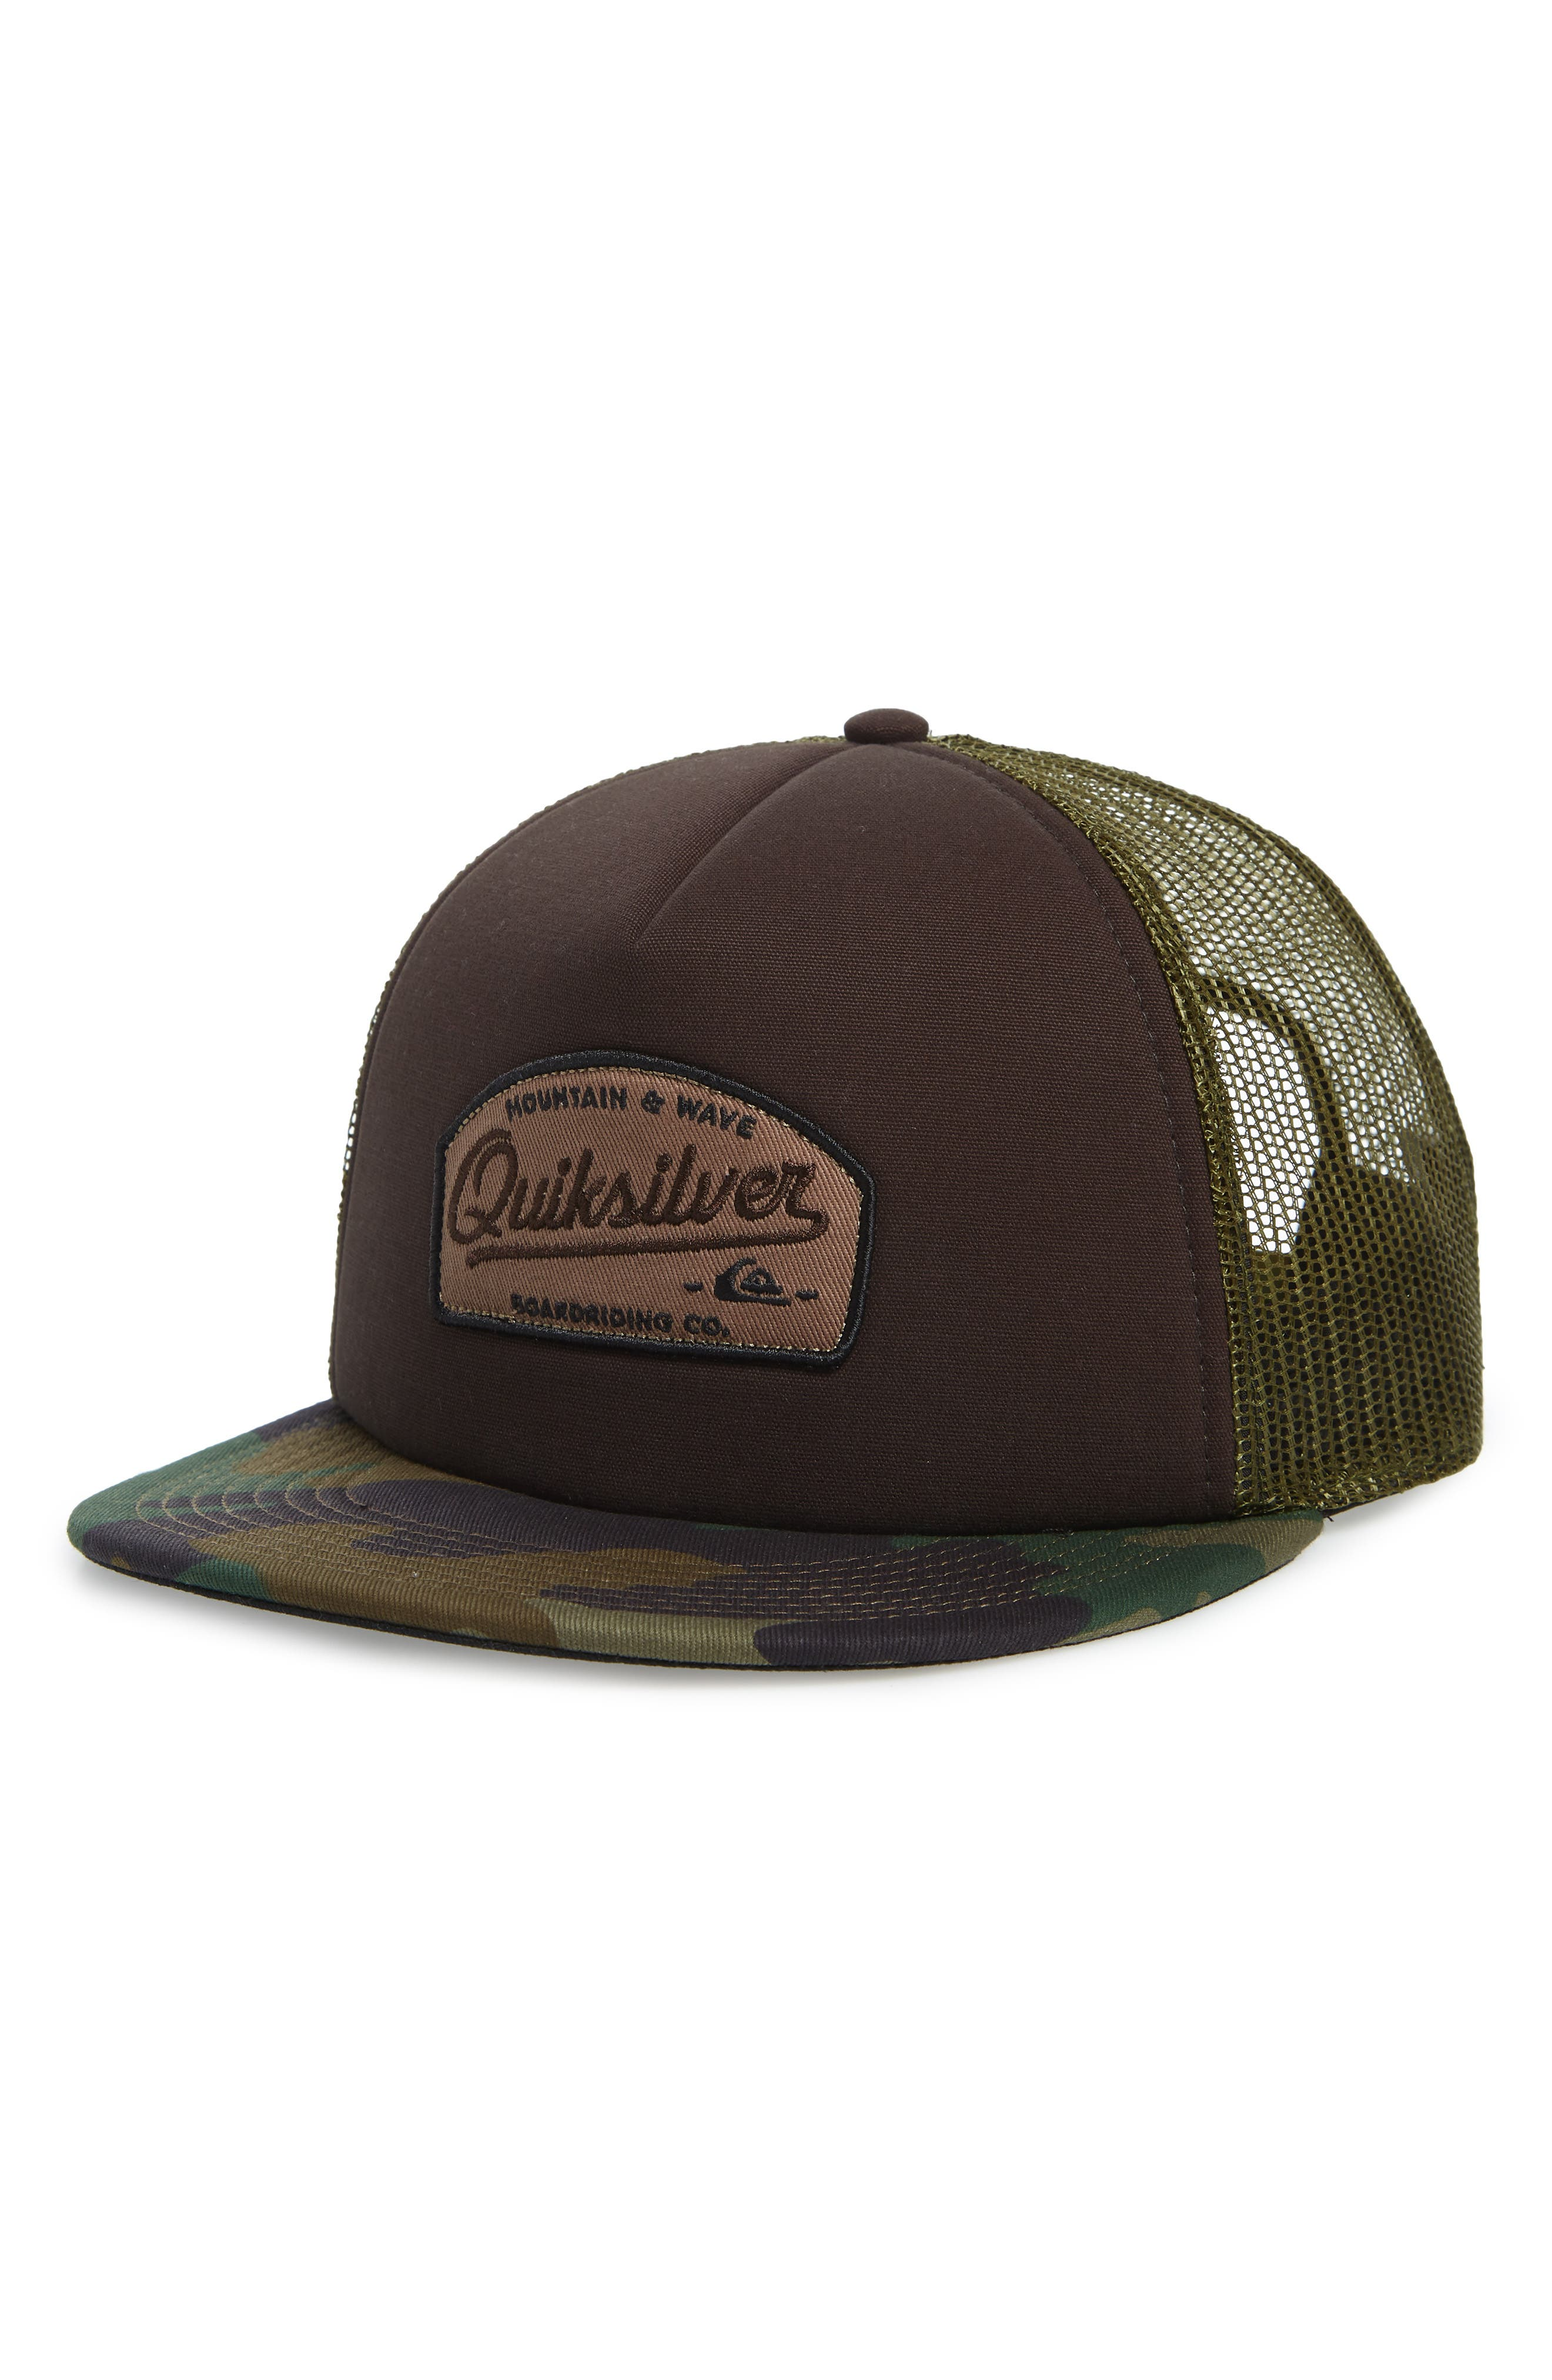 QUIKSILVER Past Checker Trucker Hat - Brown in Chocolate Brown